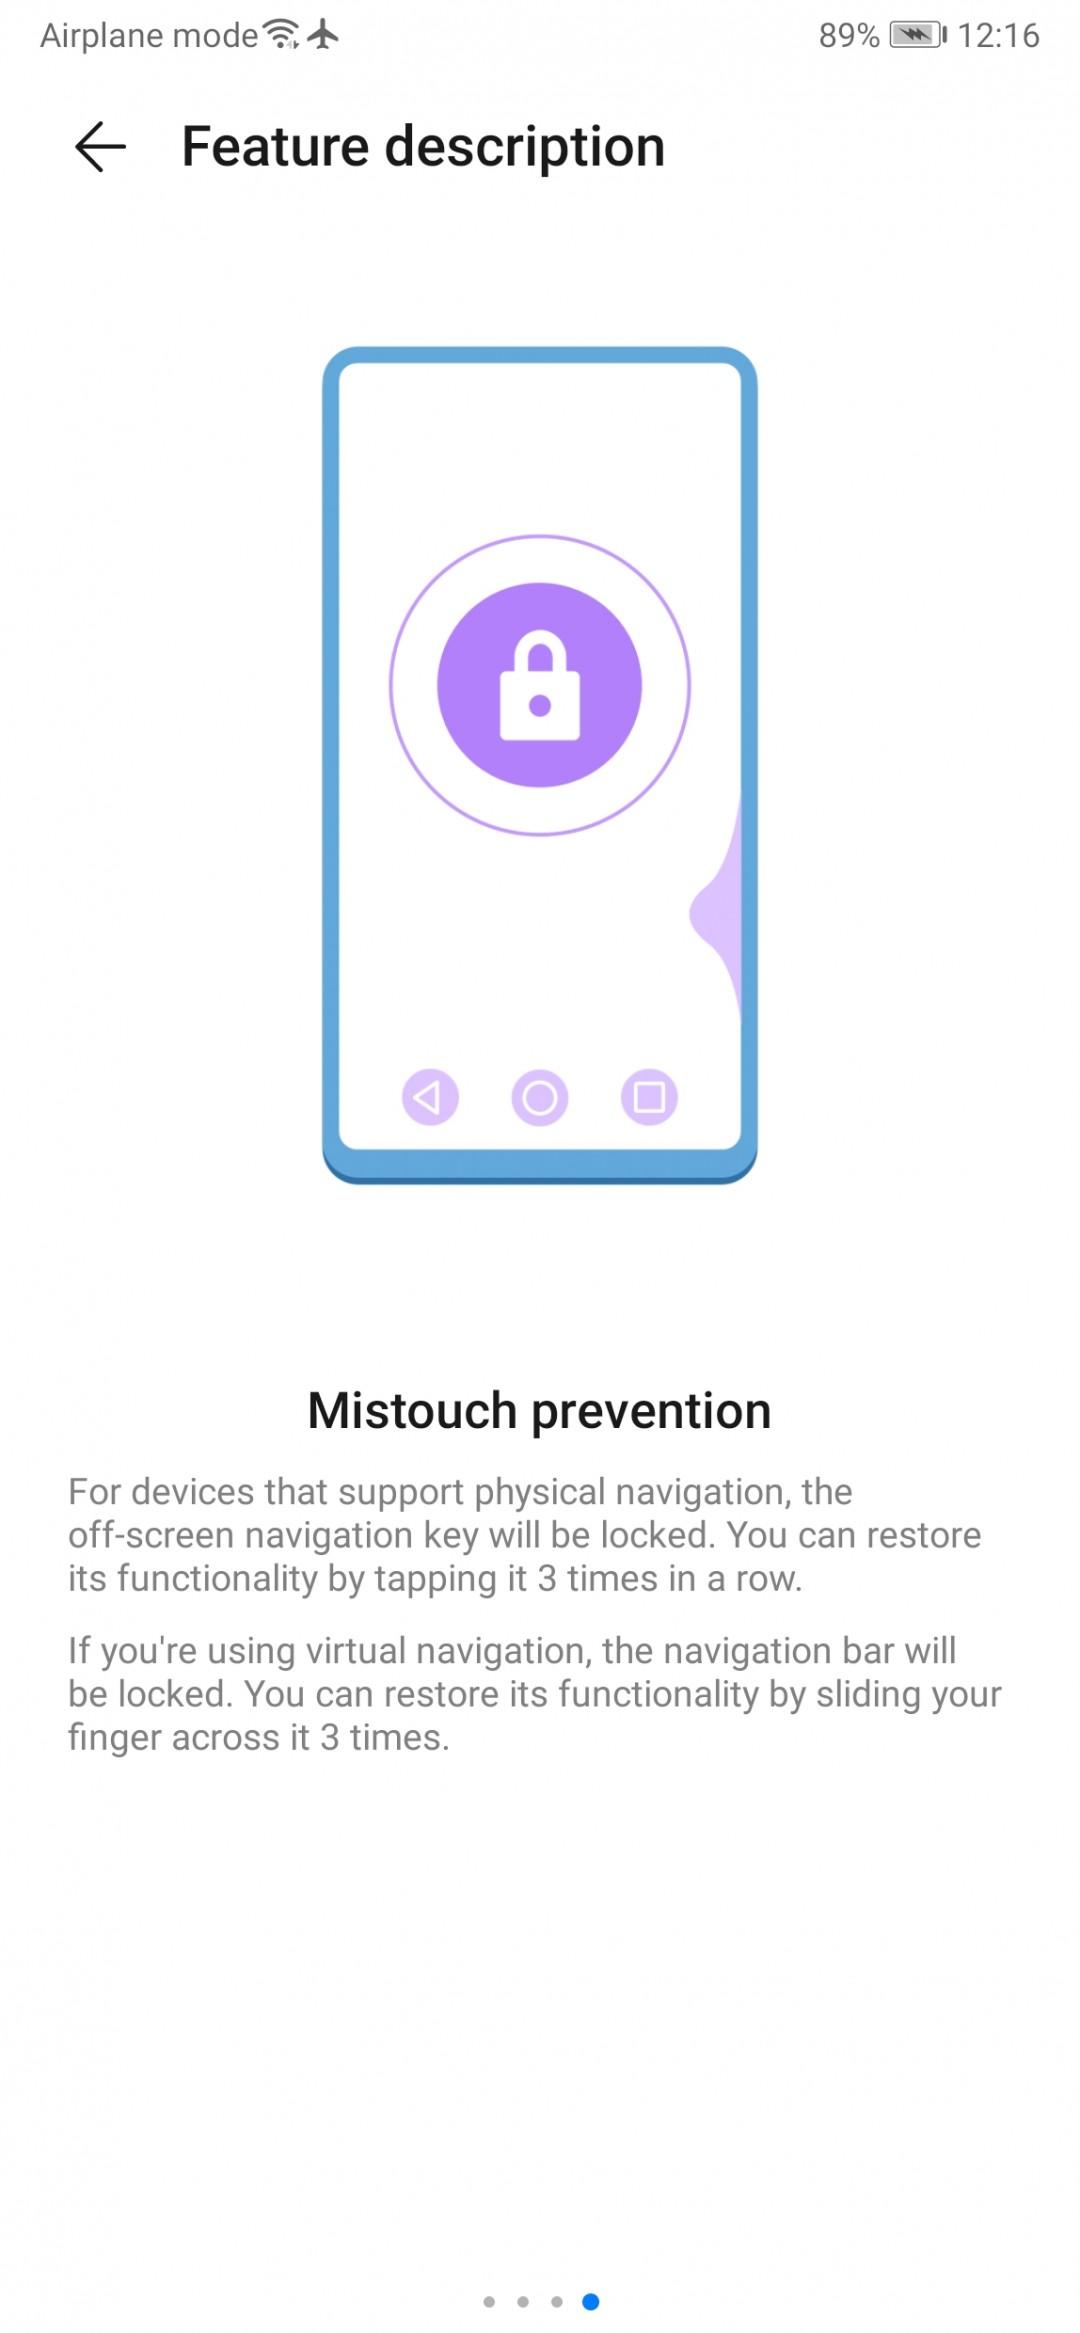 بررسی کامل و تخصصی گوشی Mate Xs هوآوی - میت ایکس اس هوآوی